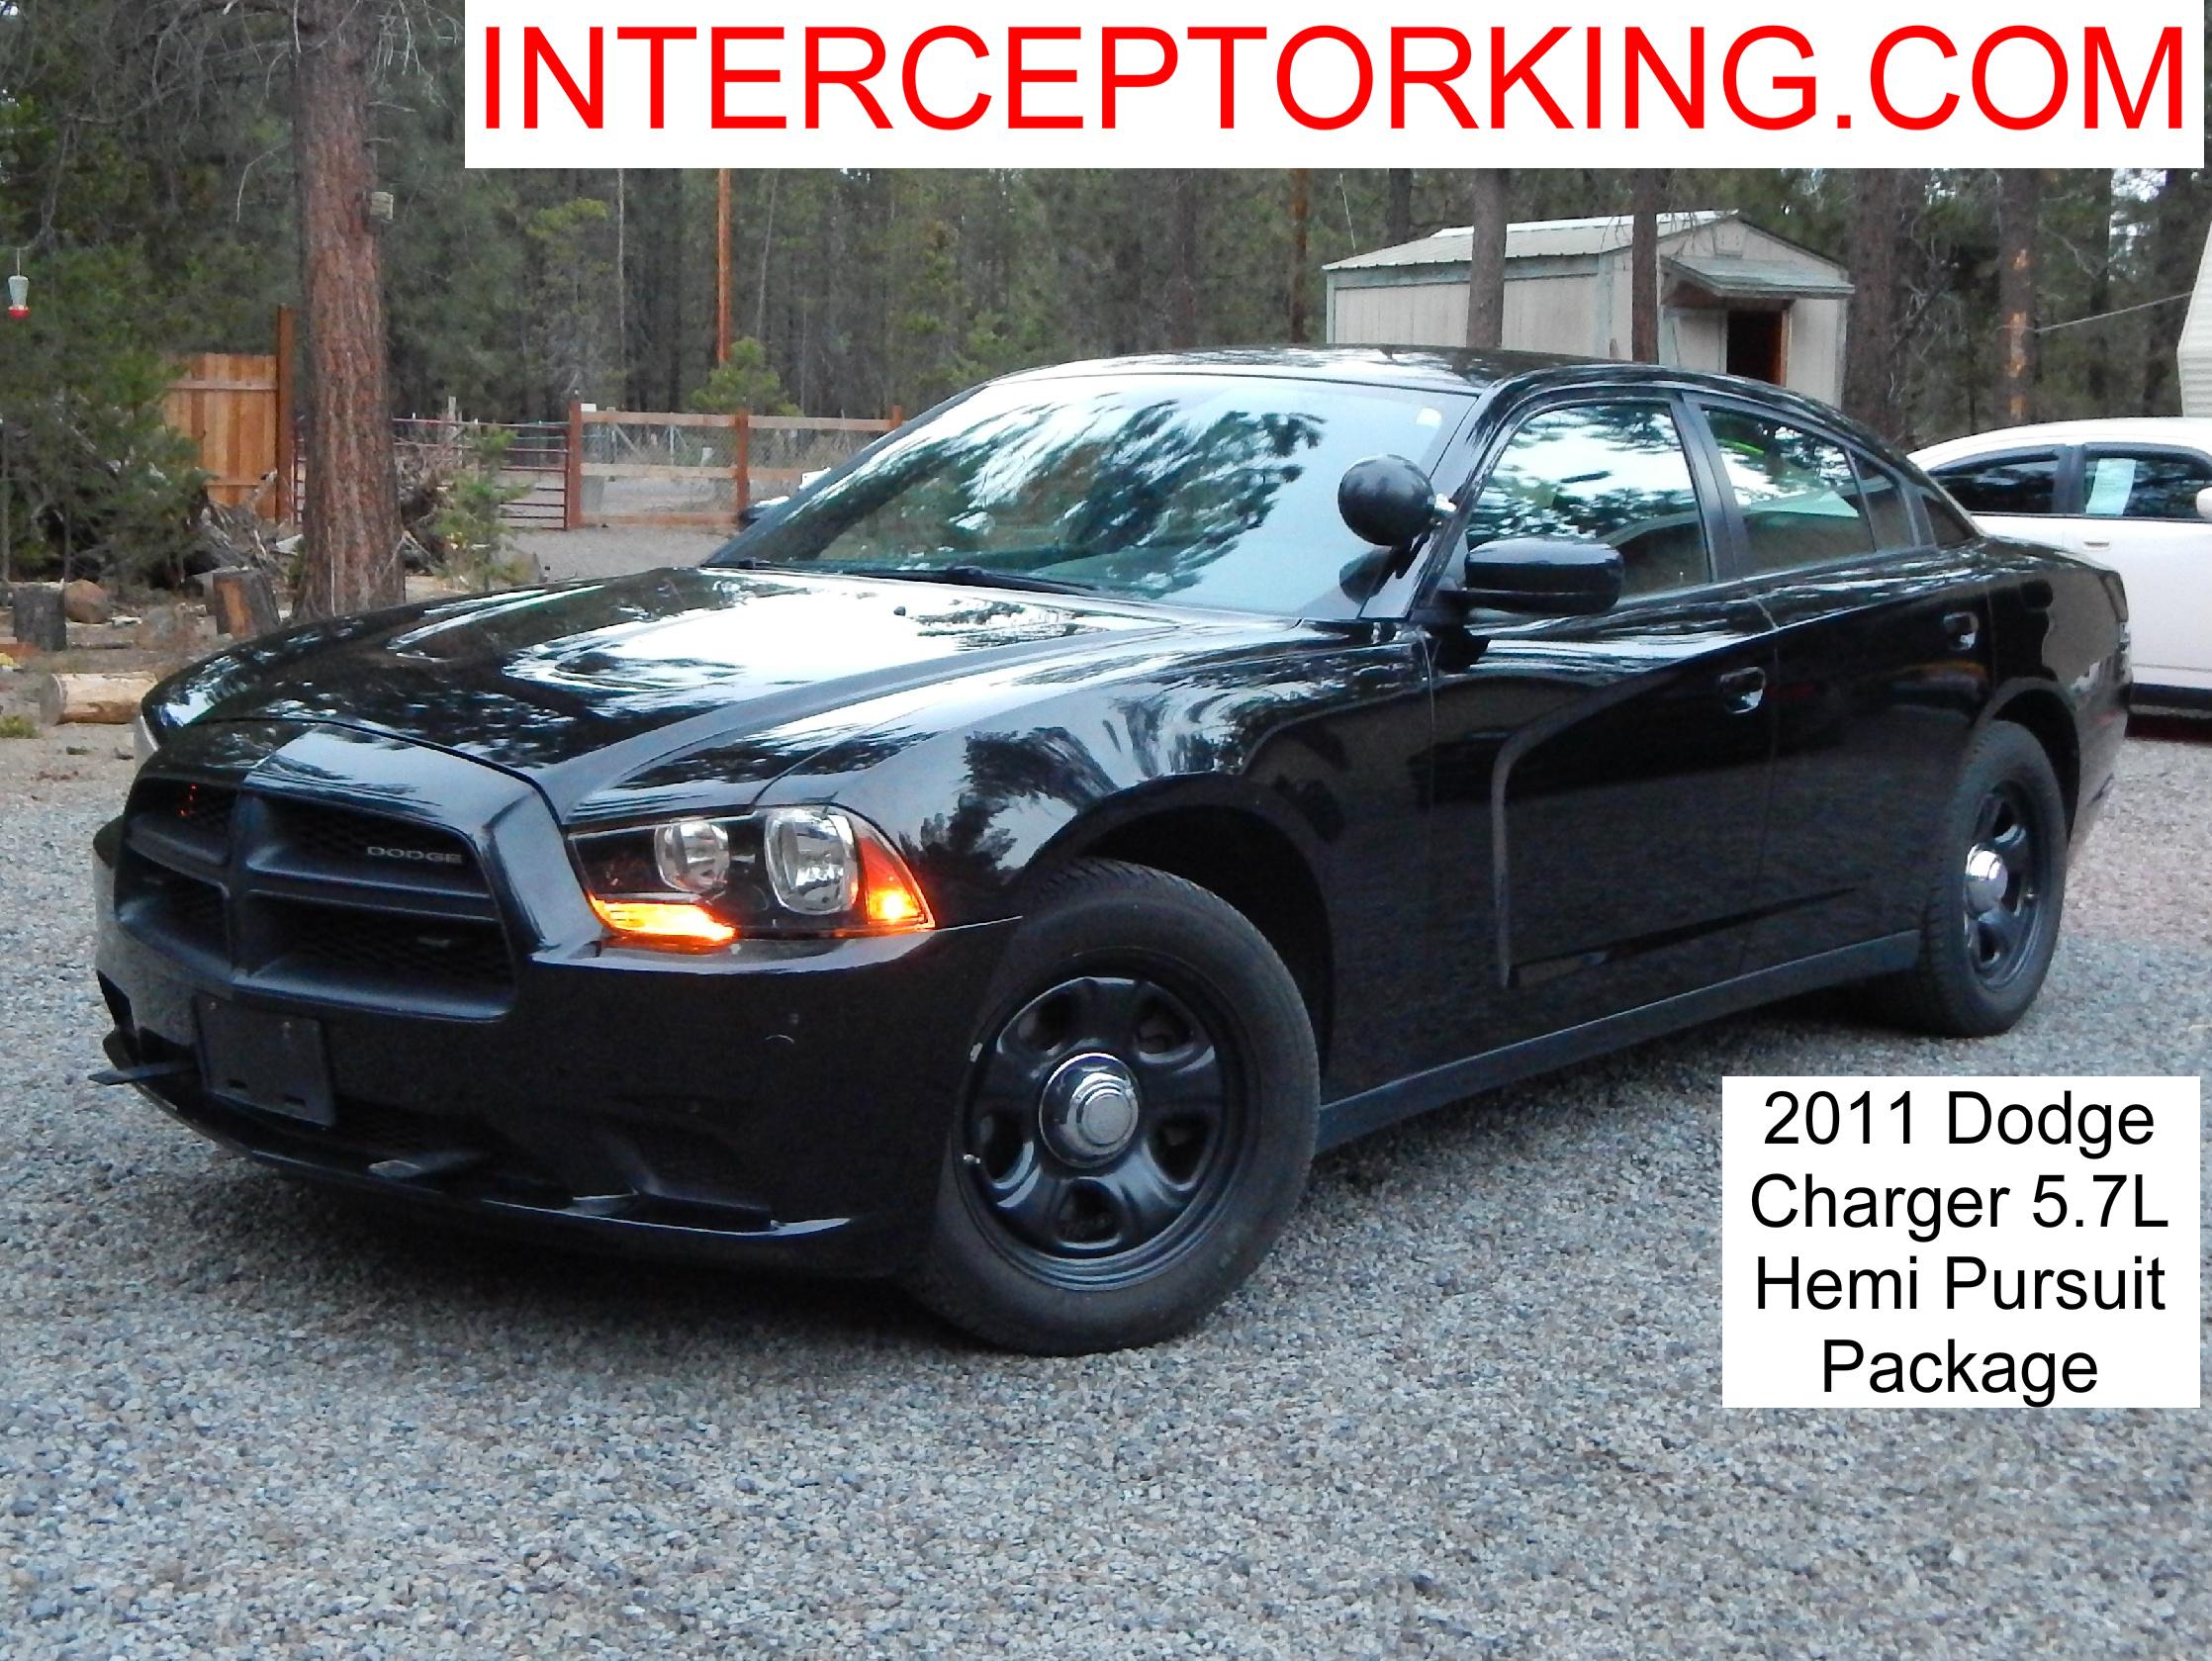 2011 Dodge Charger Pursuit Package 5 7l Hemi Interceptor King